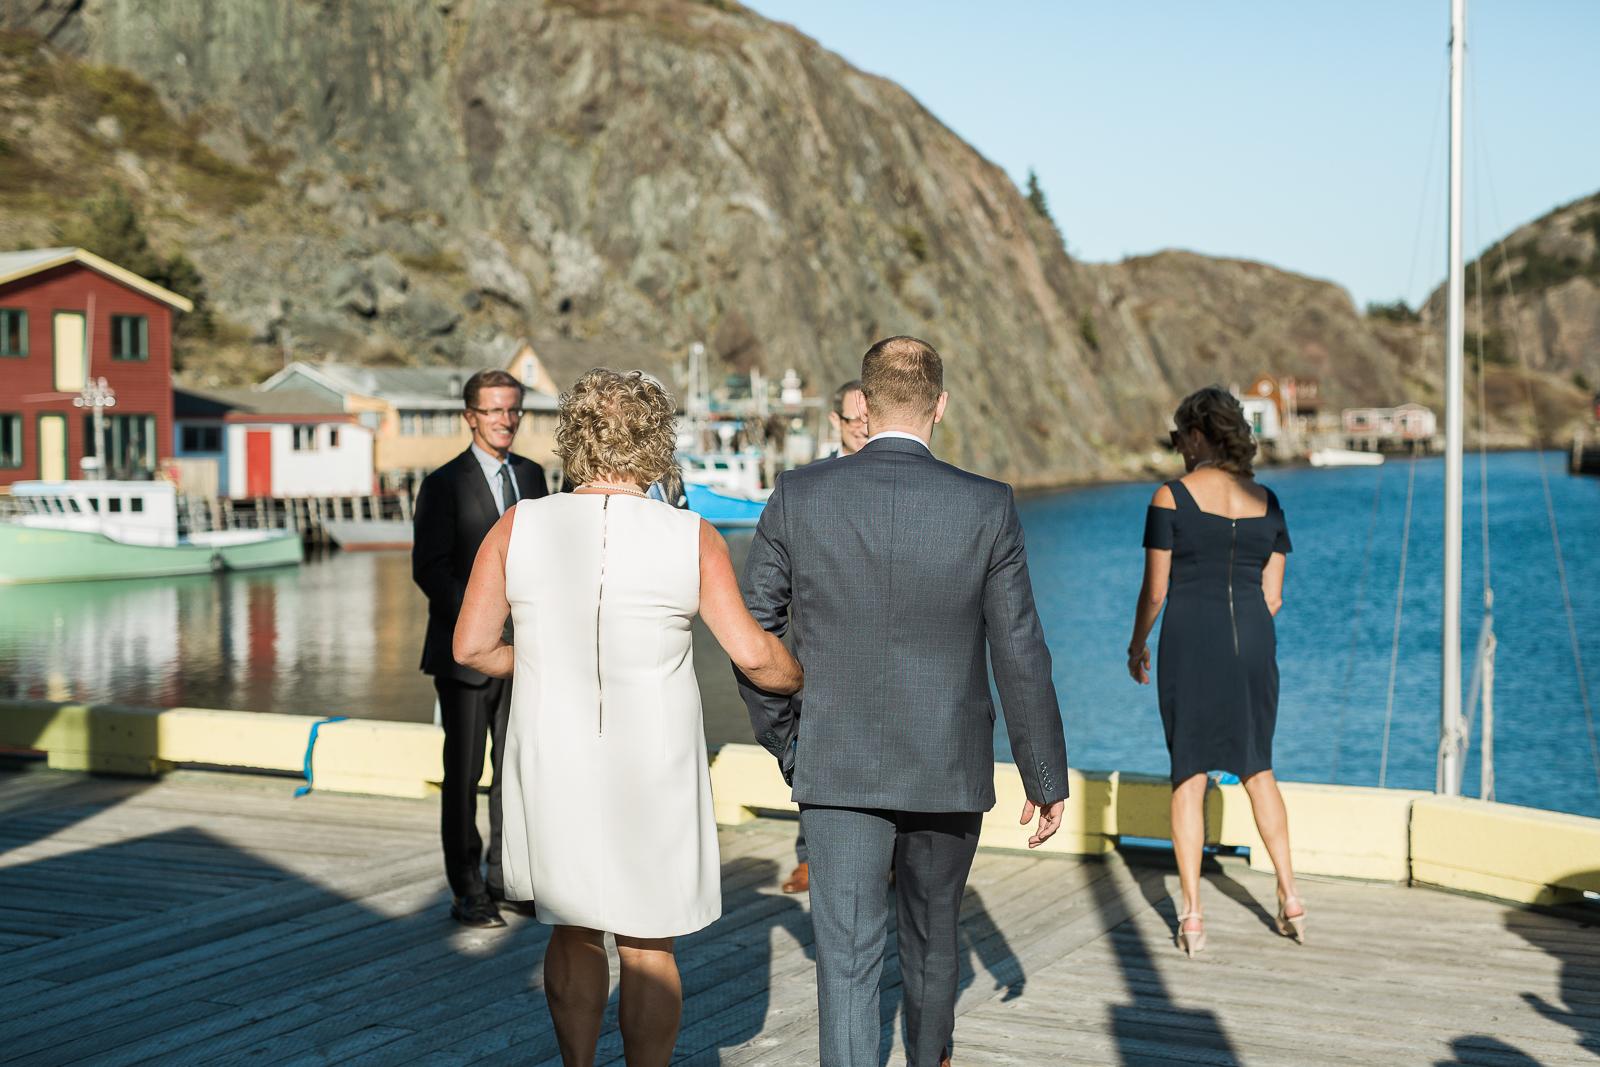 quidi-vidi-wedding-photographer-michelle-don-7.jpg